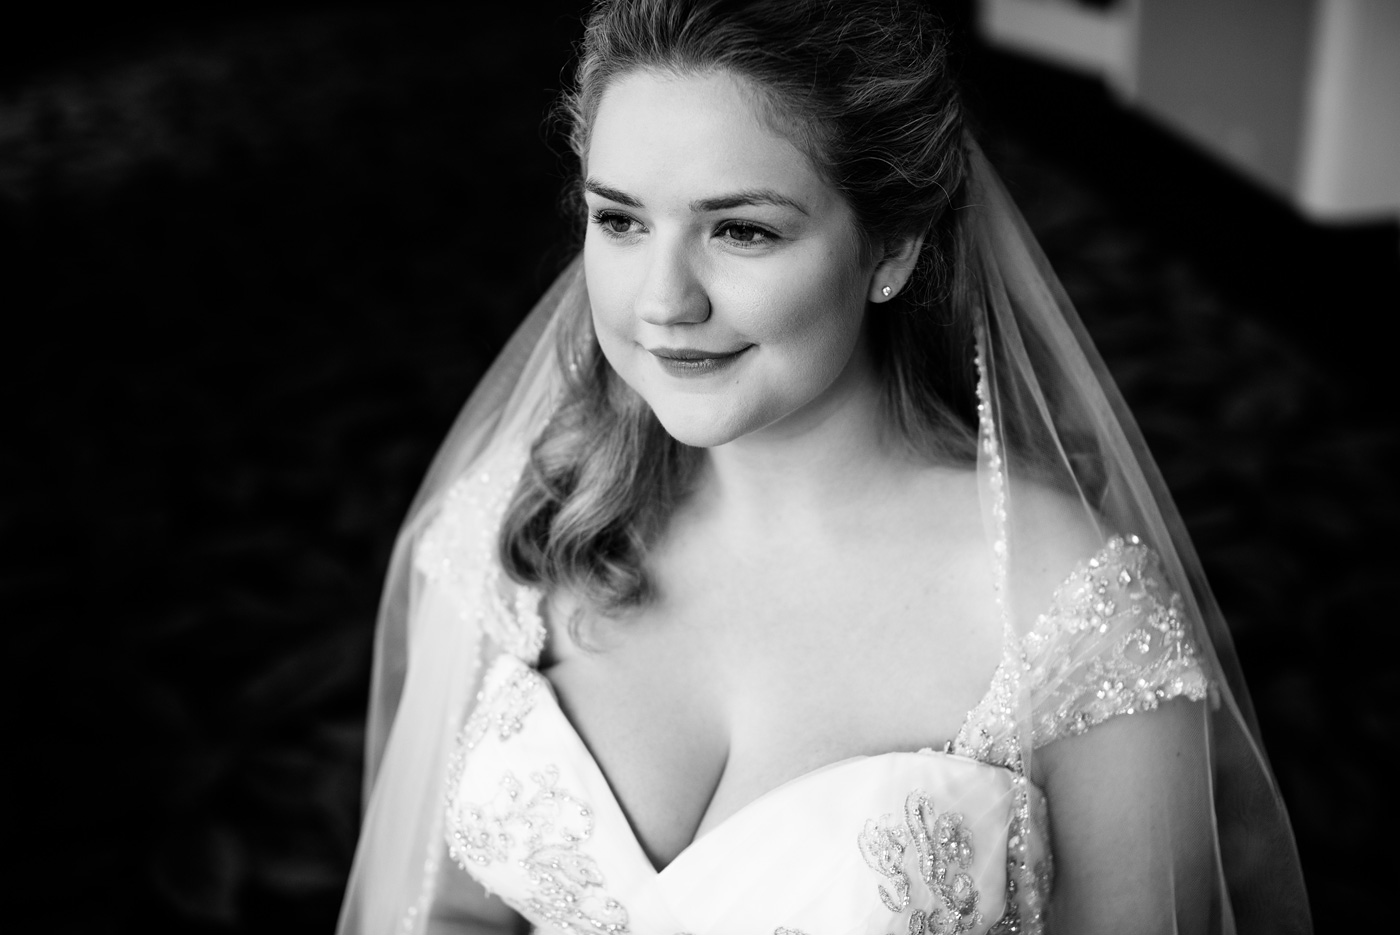 greenbrier resort bride